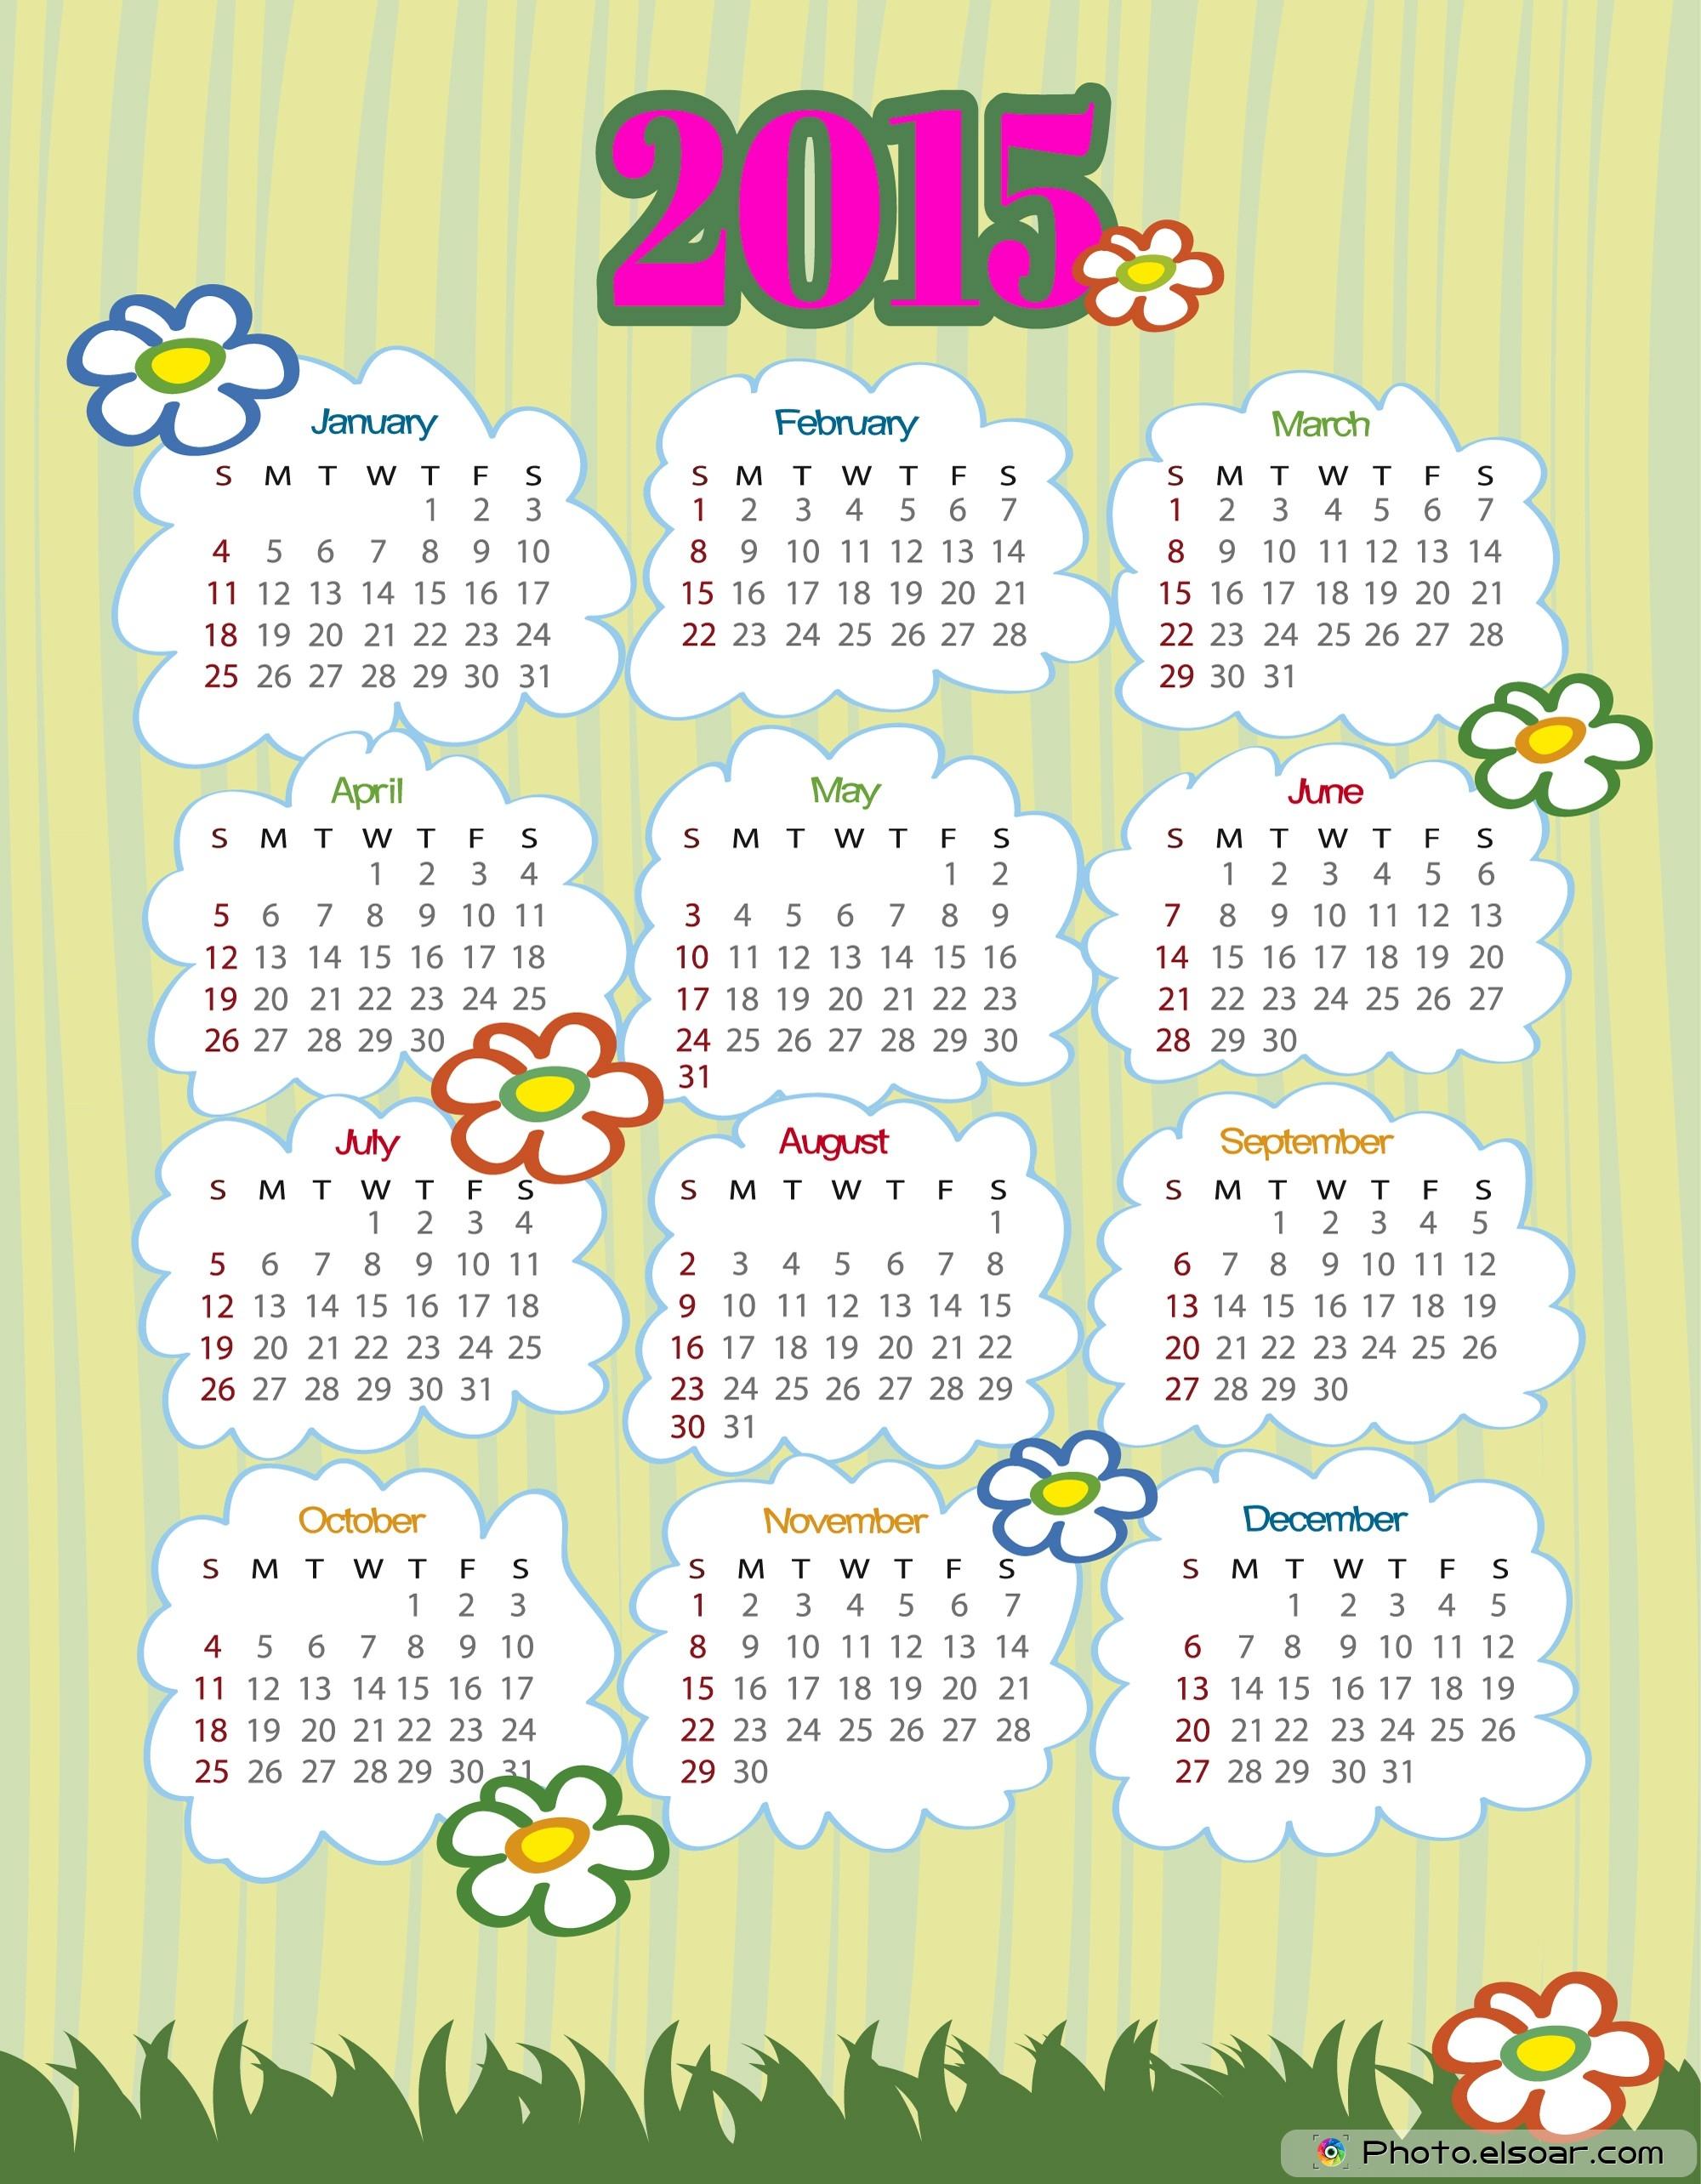 7 Images of Floral 2015 Calendar Printable